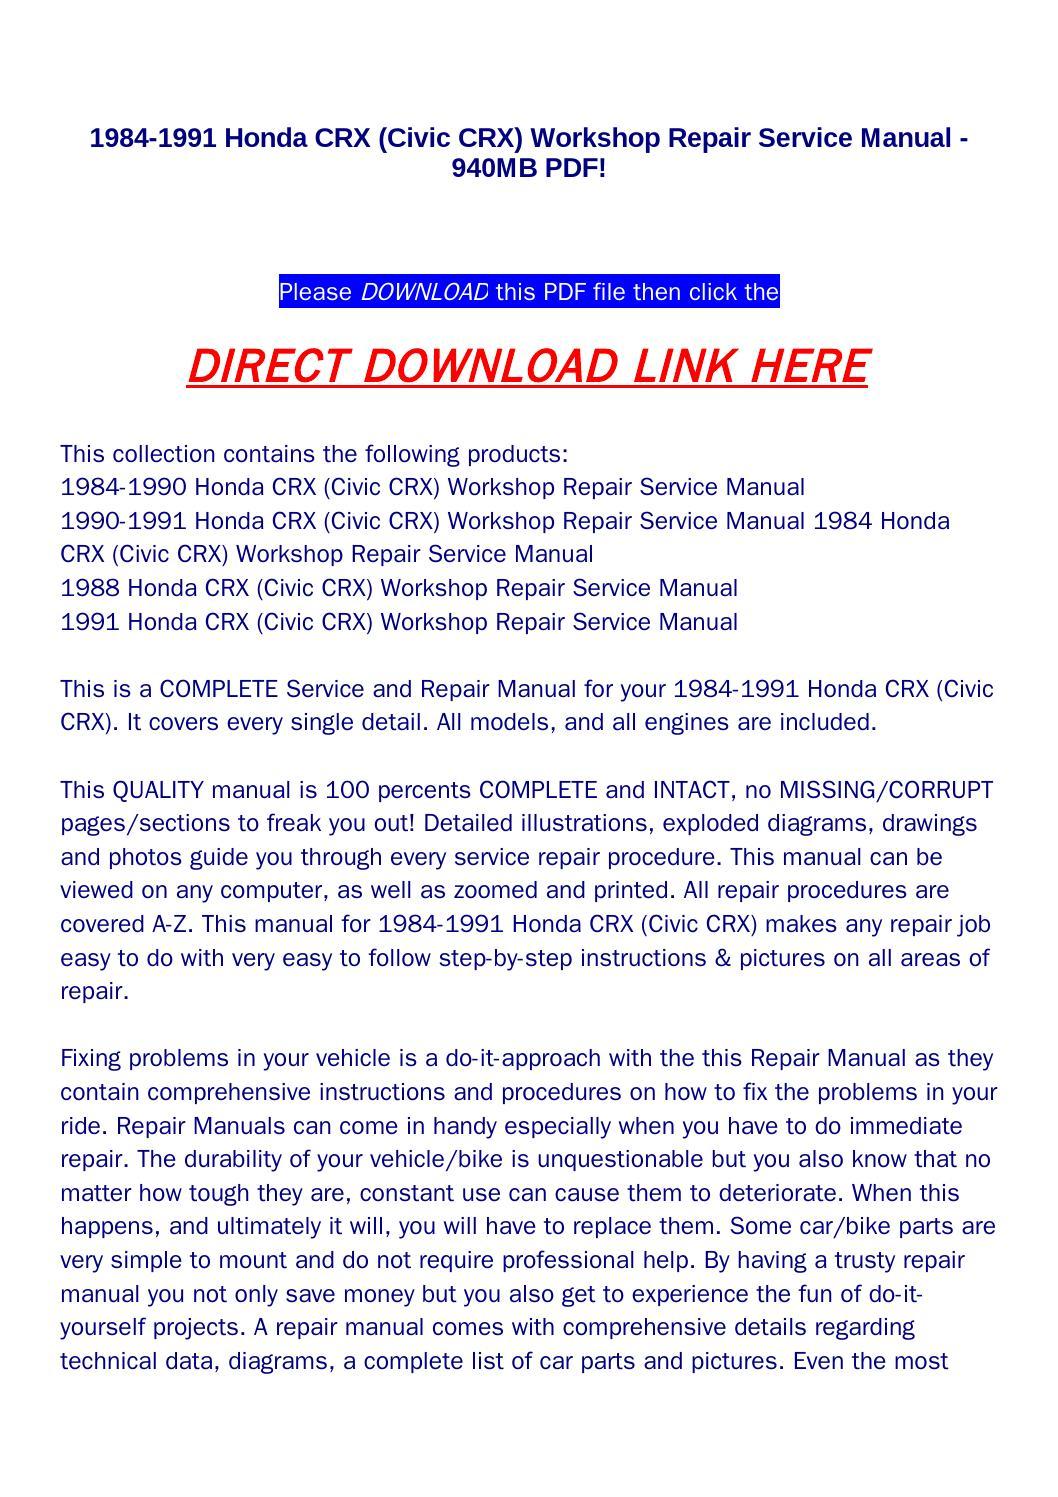 1984 1991 honda crx (civic crx) workshop repair service manual 940mb pdf!  by disrtrtog - issuu